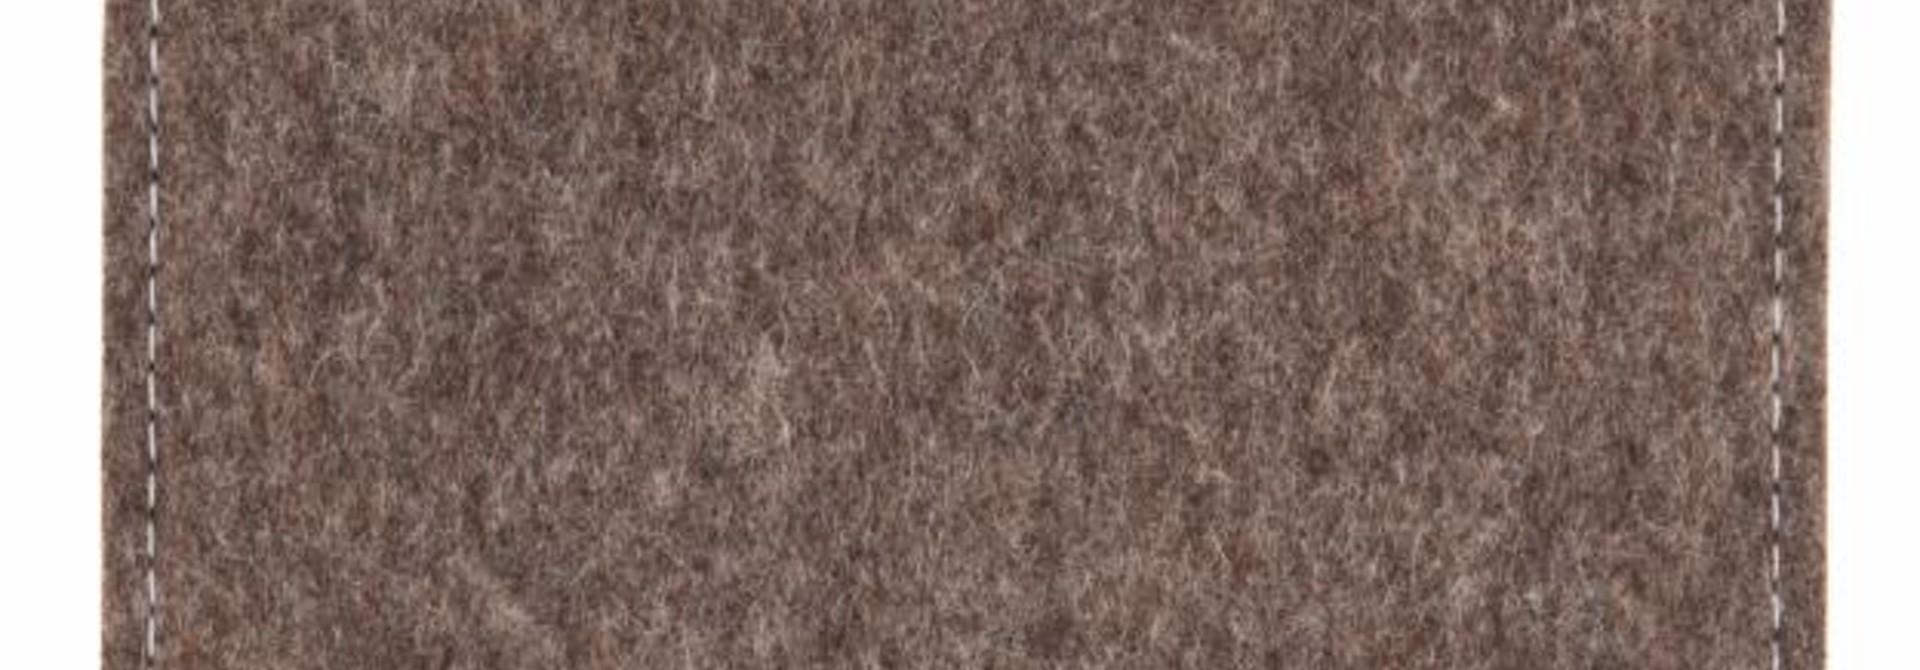 Surface Sleeve Natur-Meliert